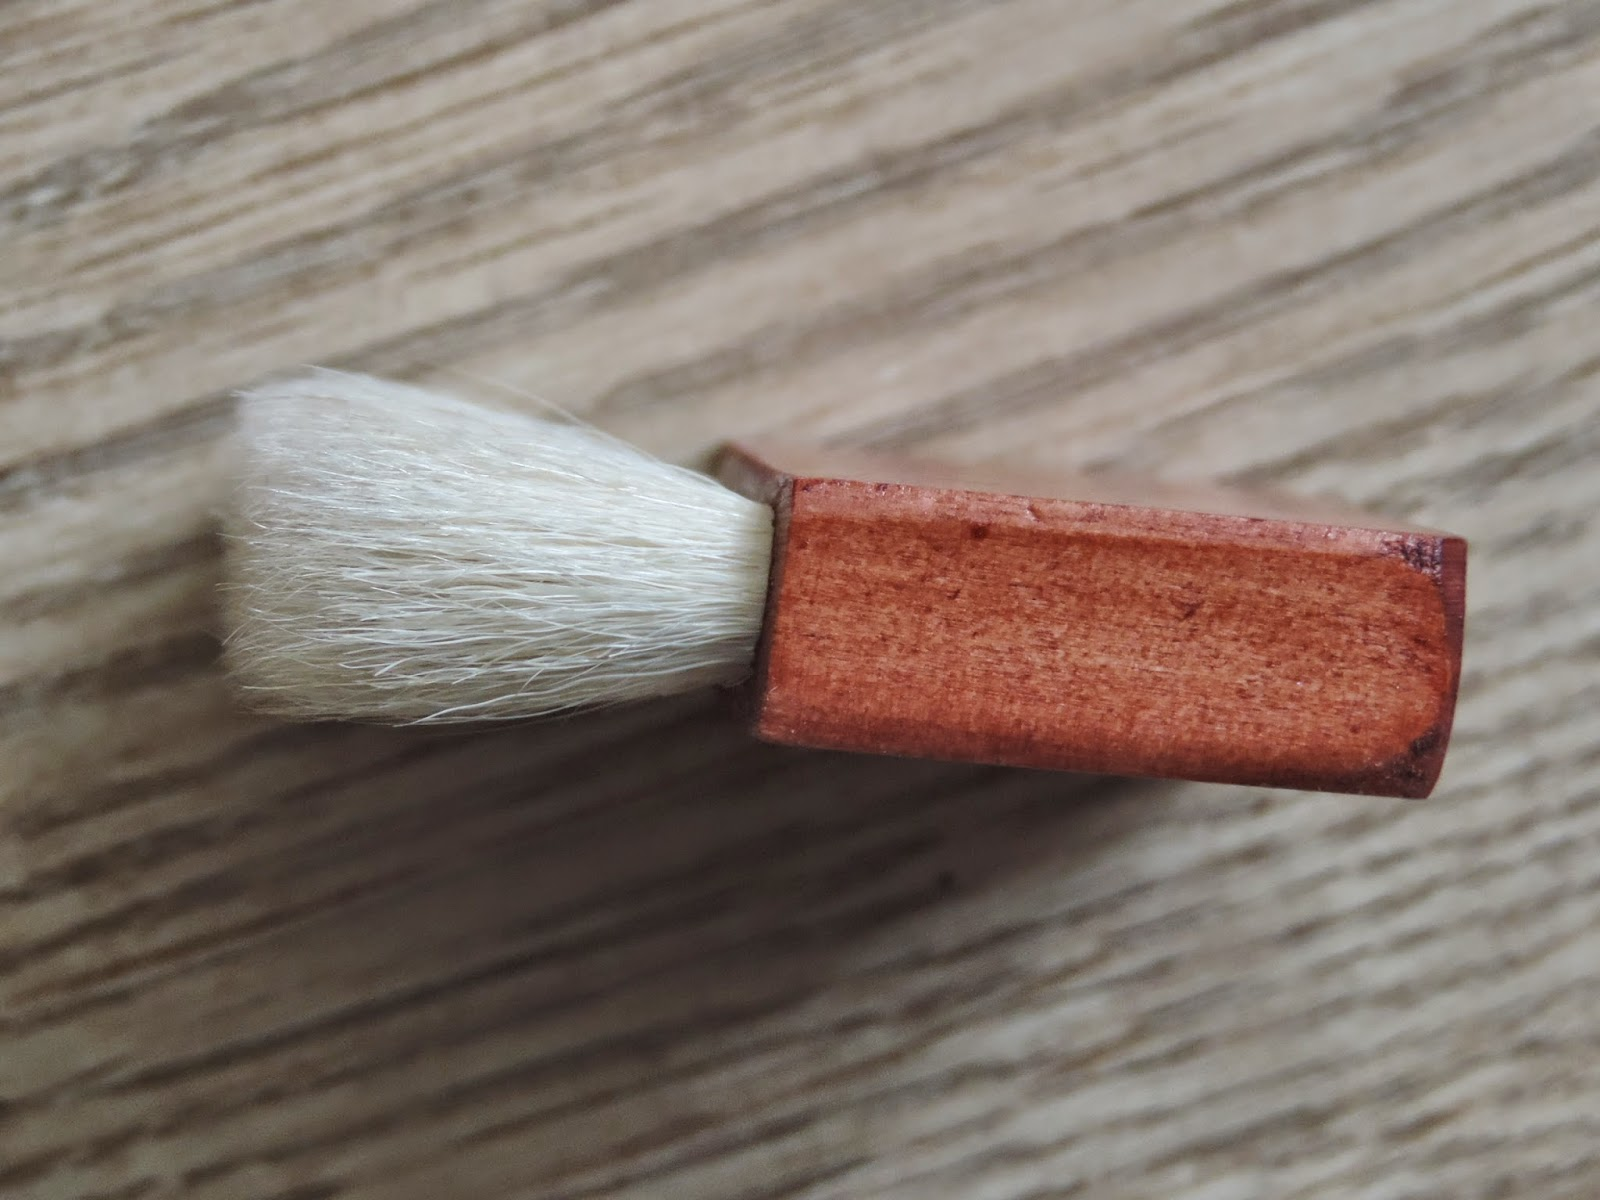 Benefit Box Powder Brush